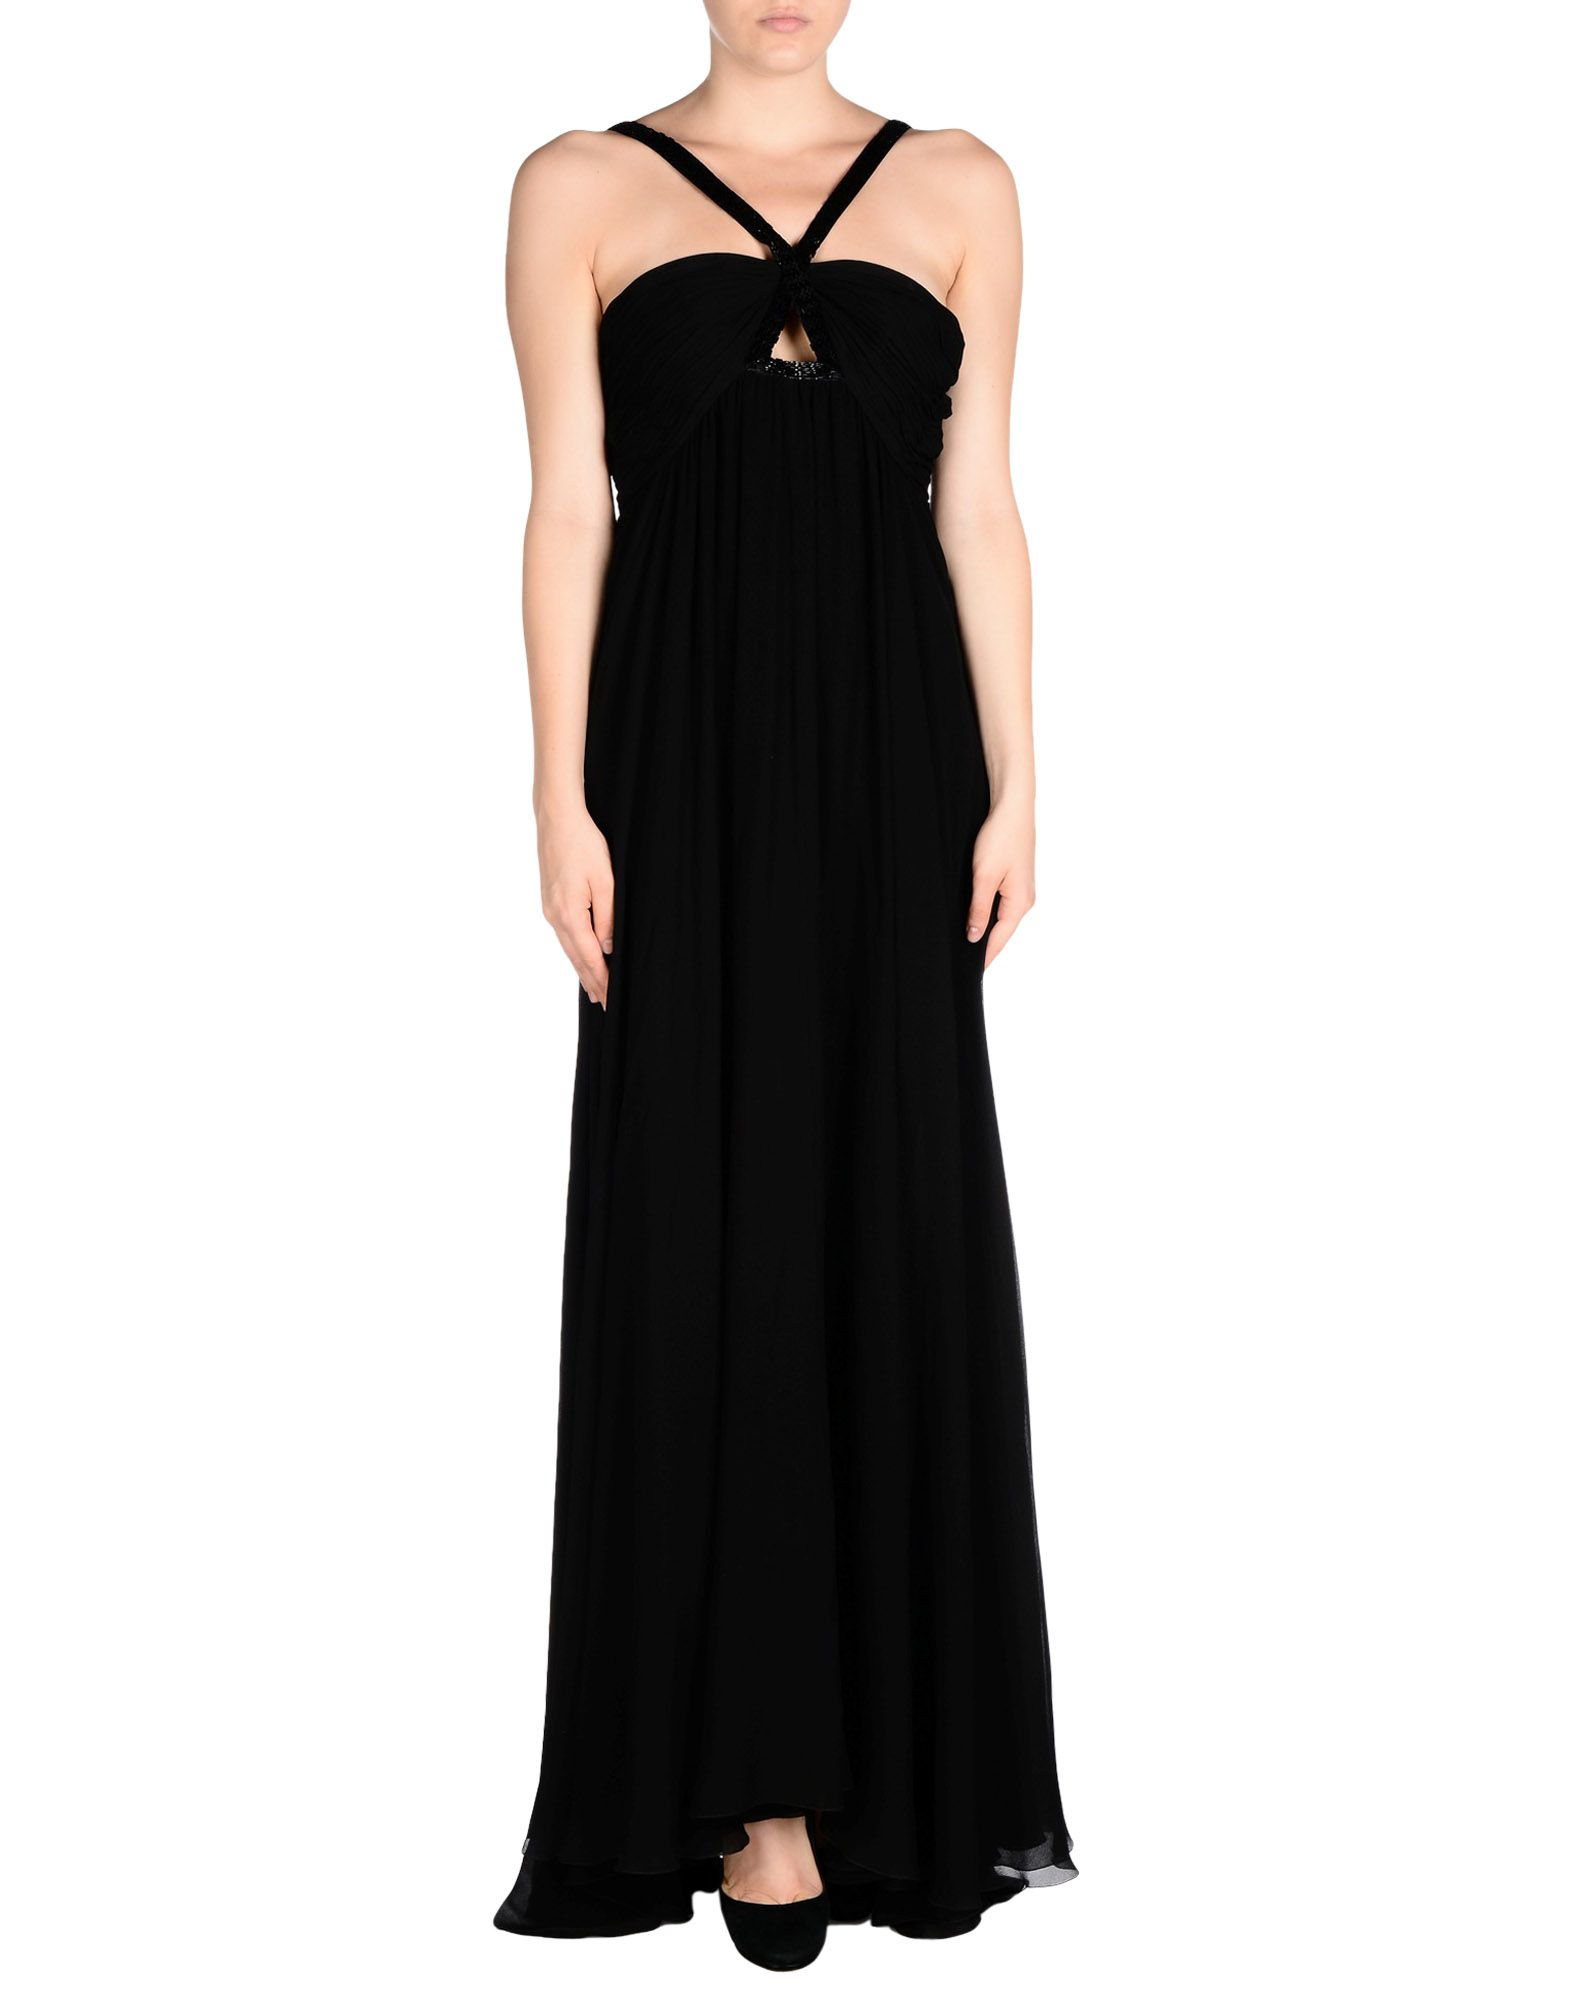 15932157cc30f Roberto Cavalli Long Black Dress – Little Black Dress | Black Lace ...